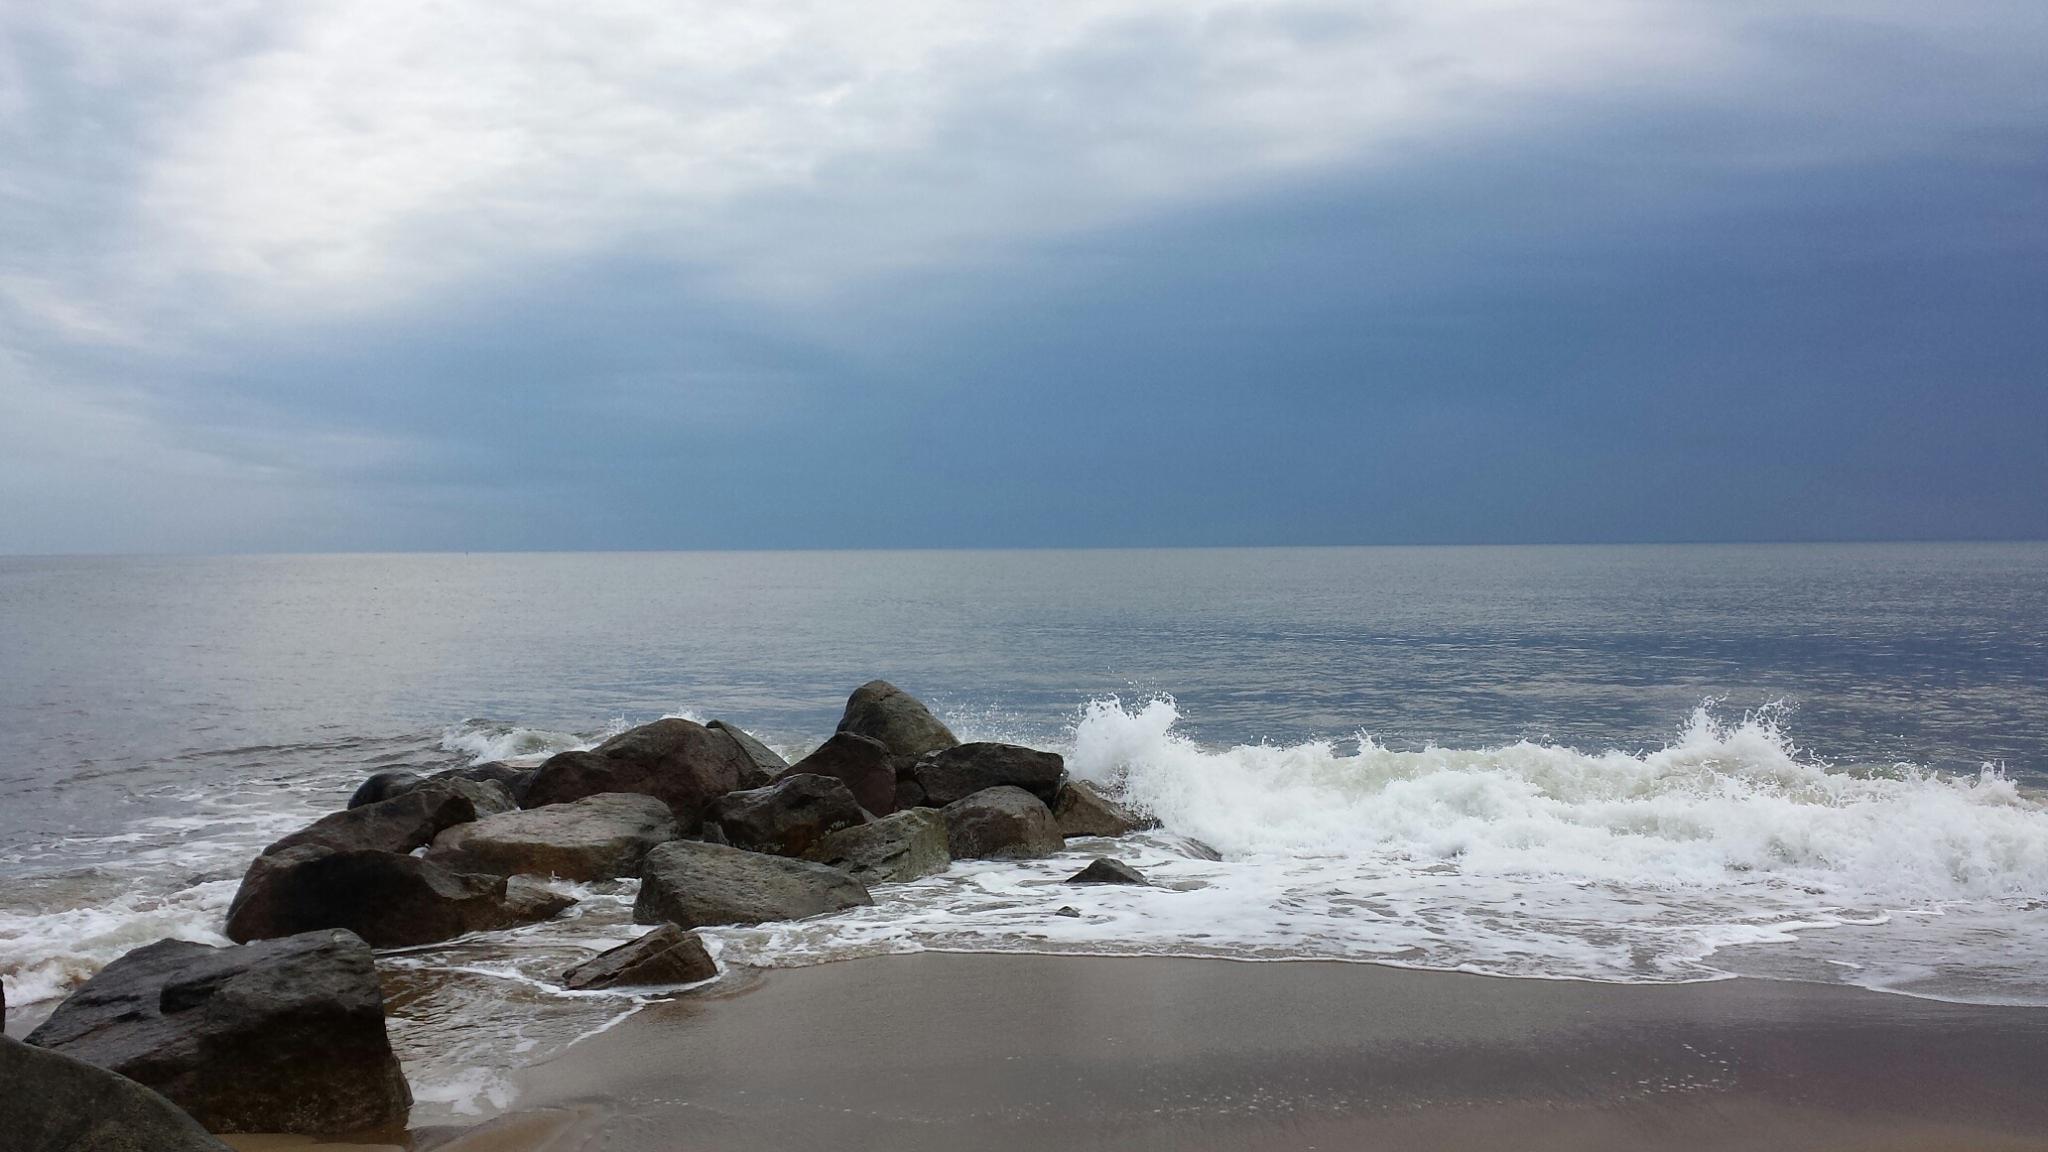 The rocks on a calm, grey day by wa6dia359